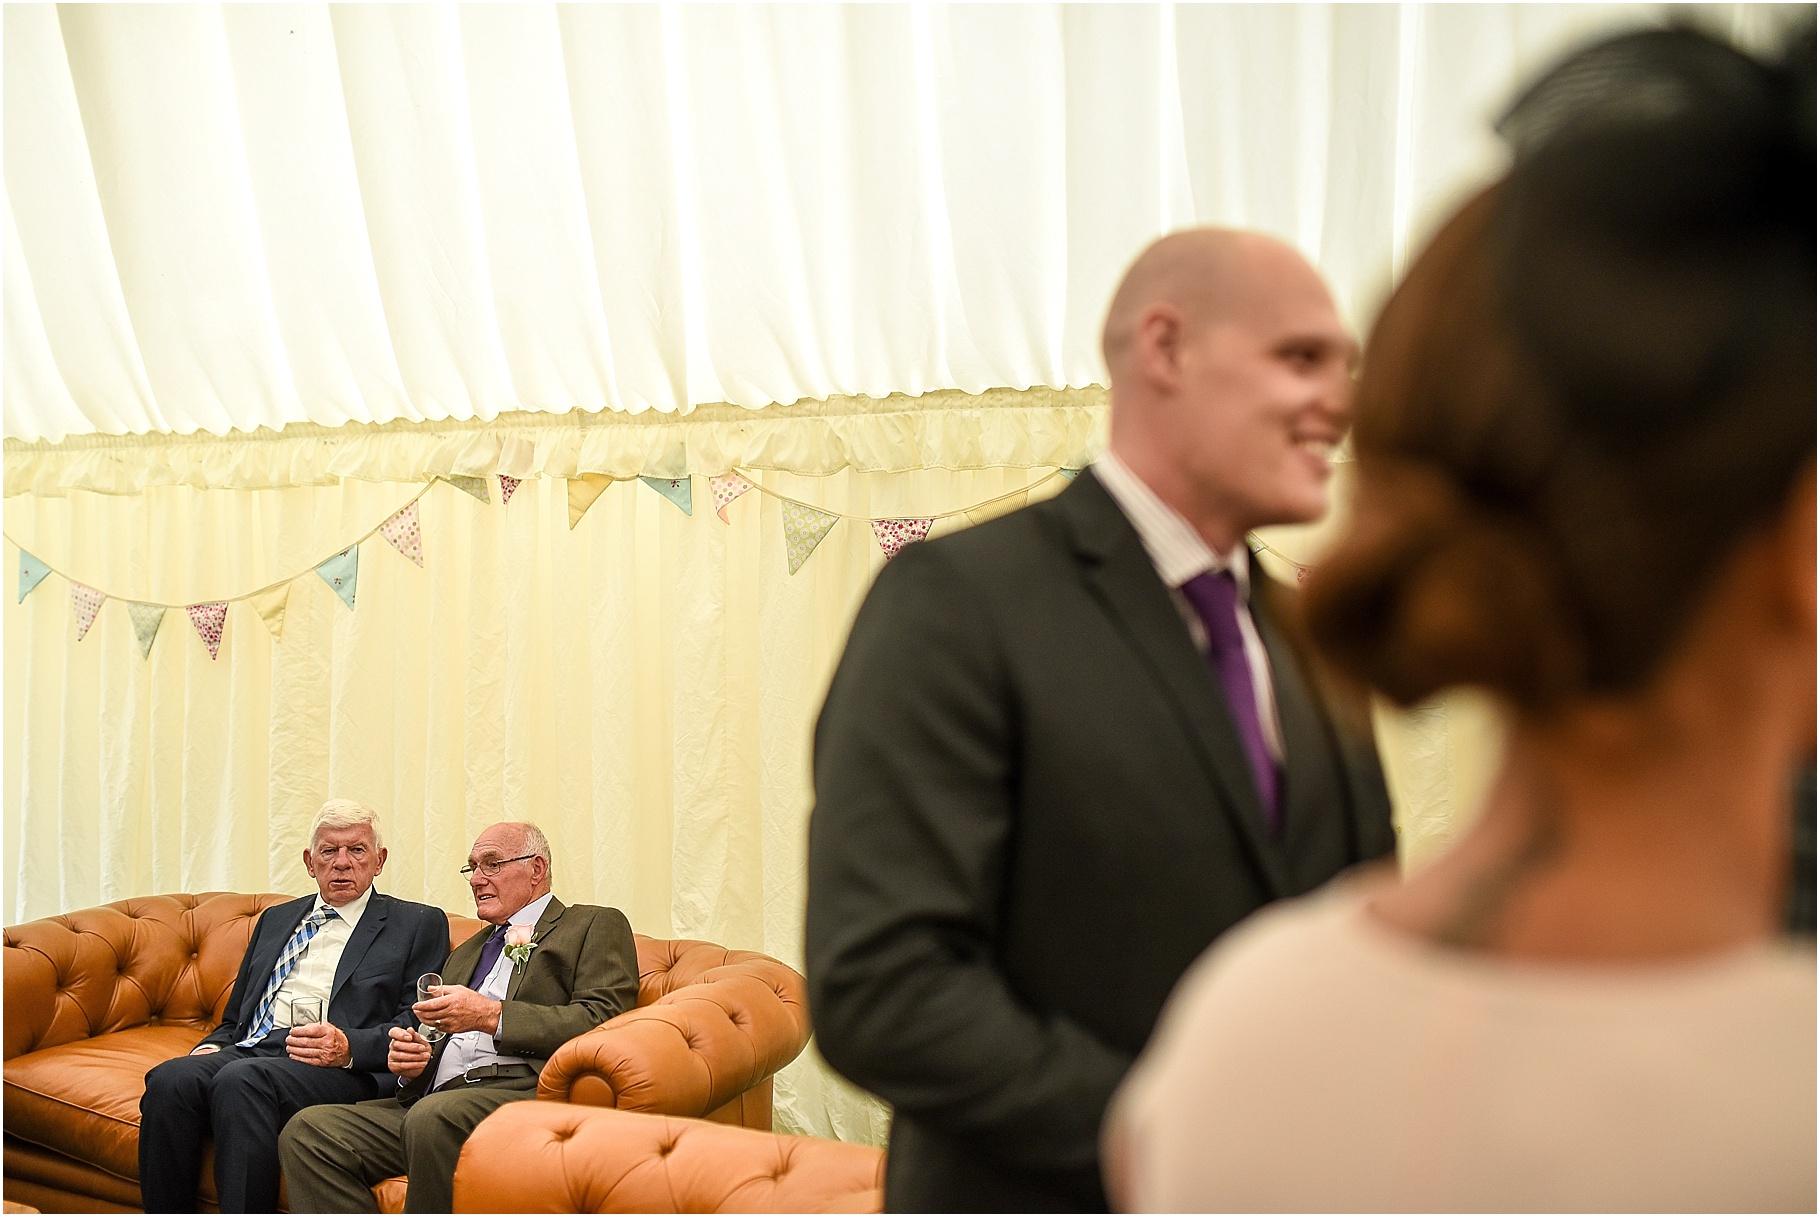 lancashire-marquee-wedding-050.jpg